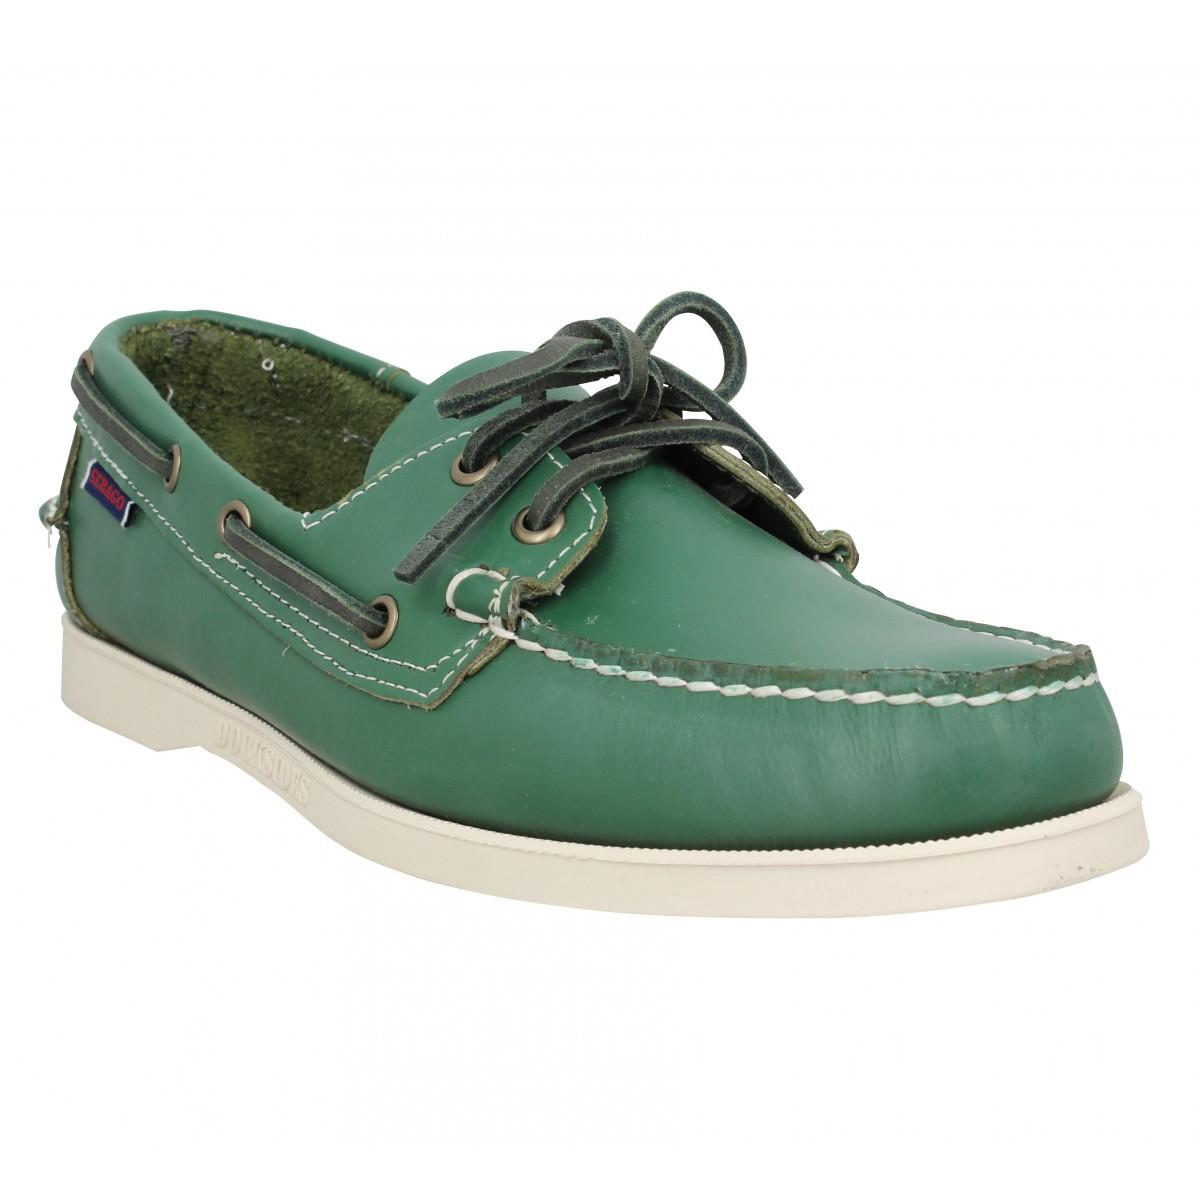 Chaussures bateaux SEBAGO Docksides Portland cuir Homme Green Forest